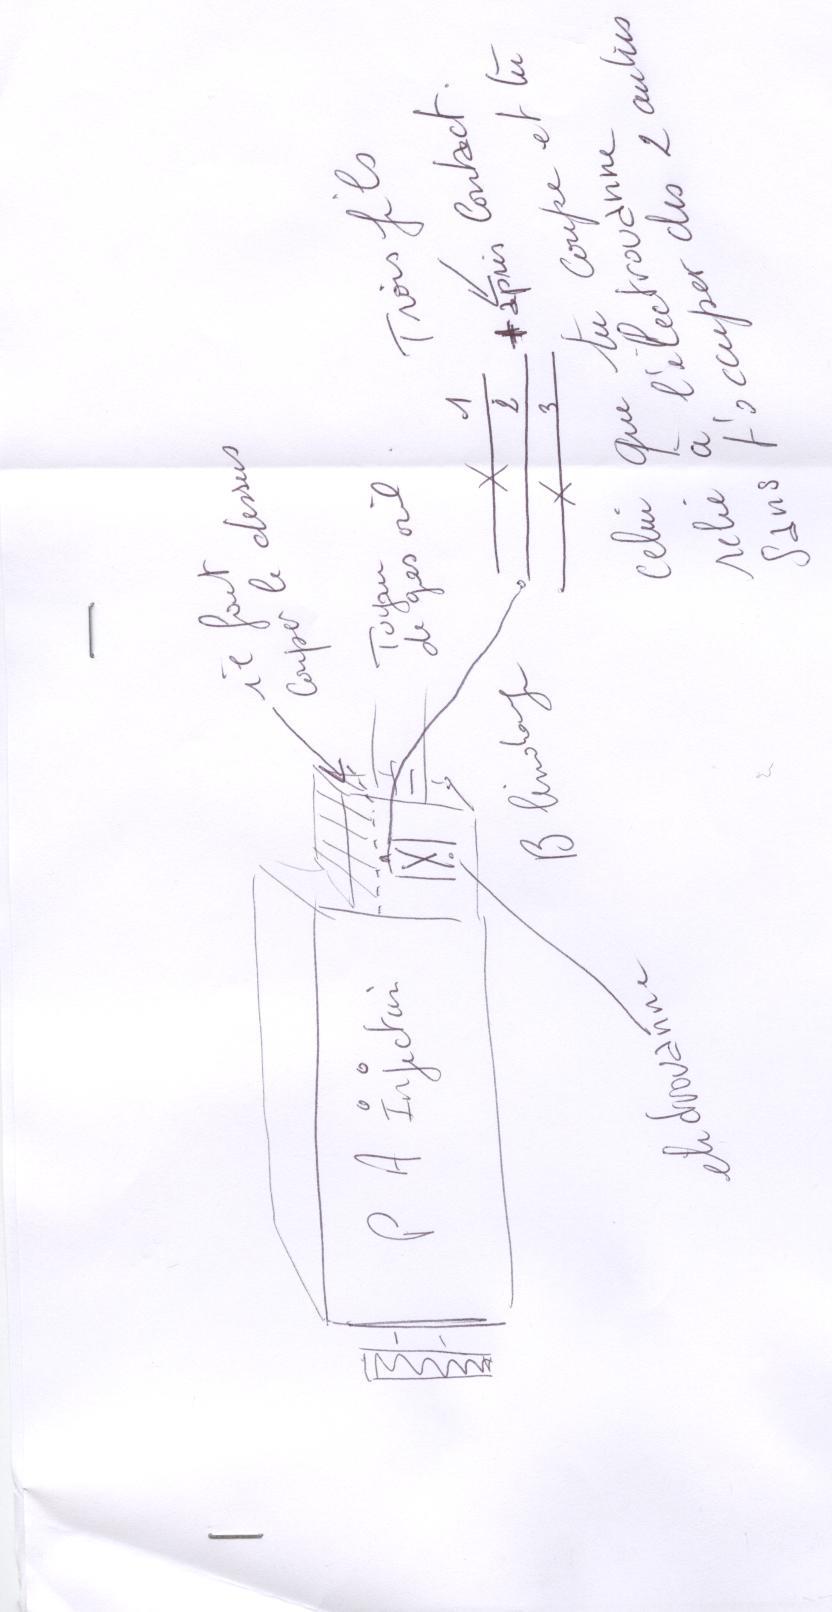 Resolurenault Megane Diesel De 1998 Rparation Mcanique Aide Renault Espace Je Wiring Diagram Electrovanne 9999999